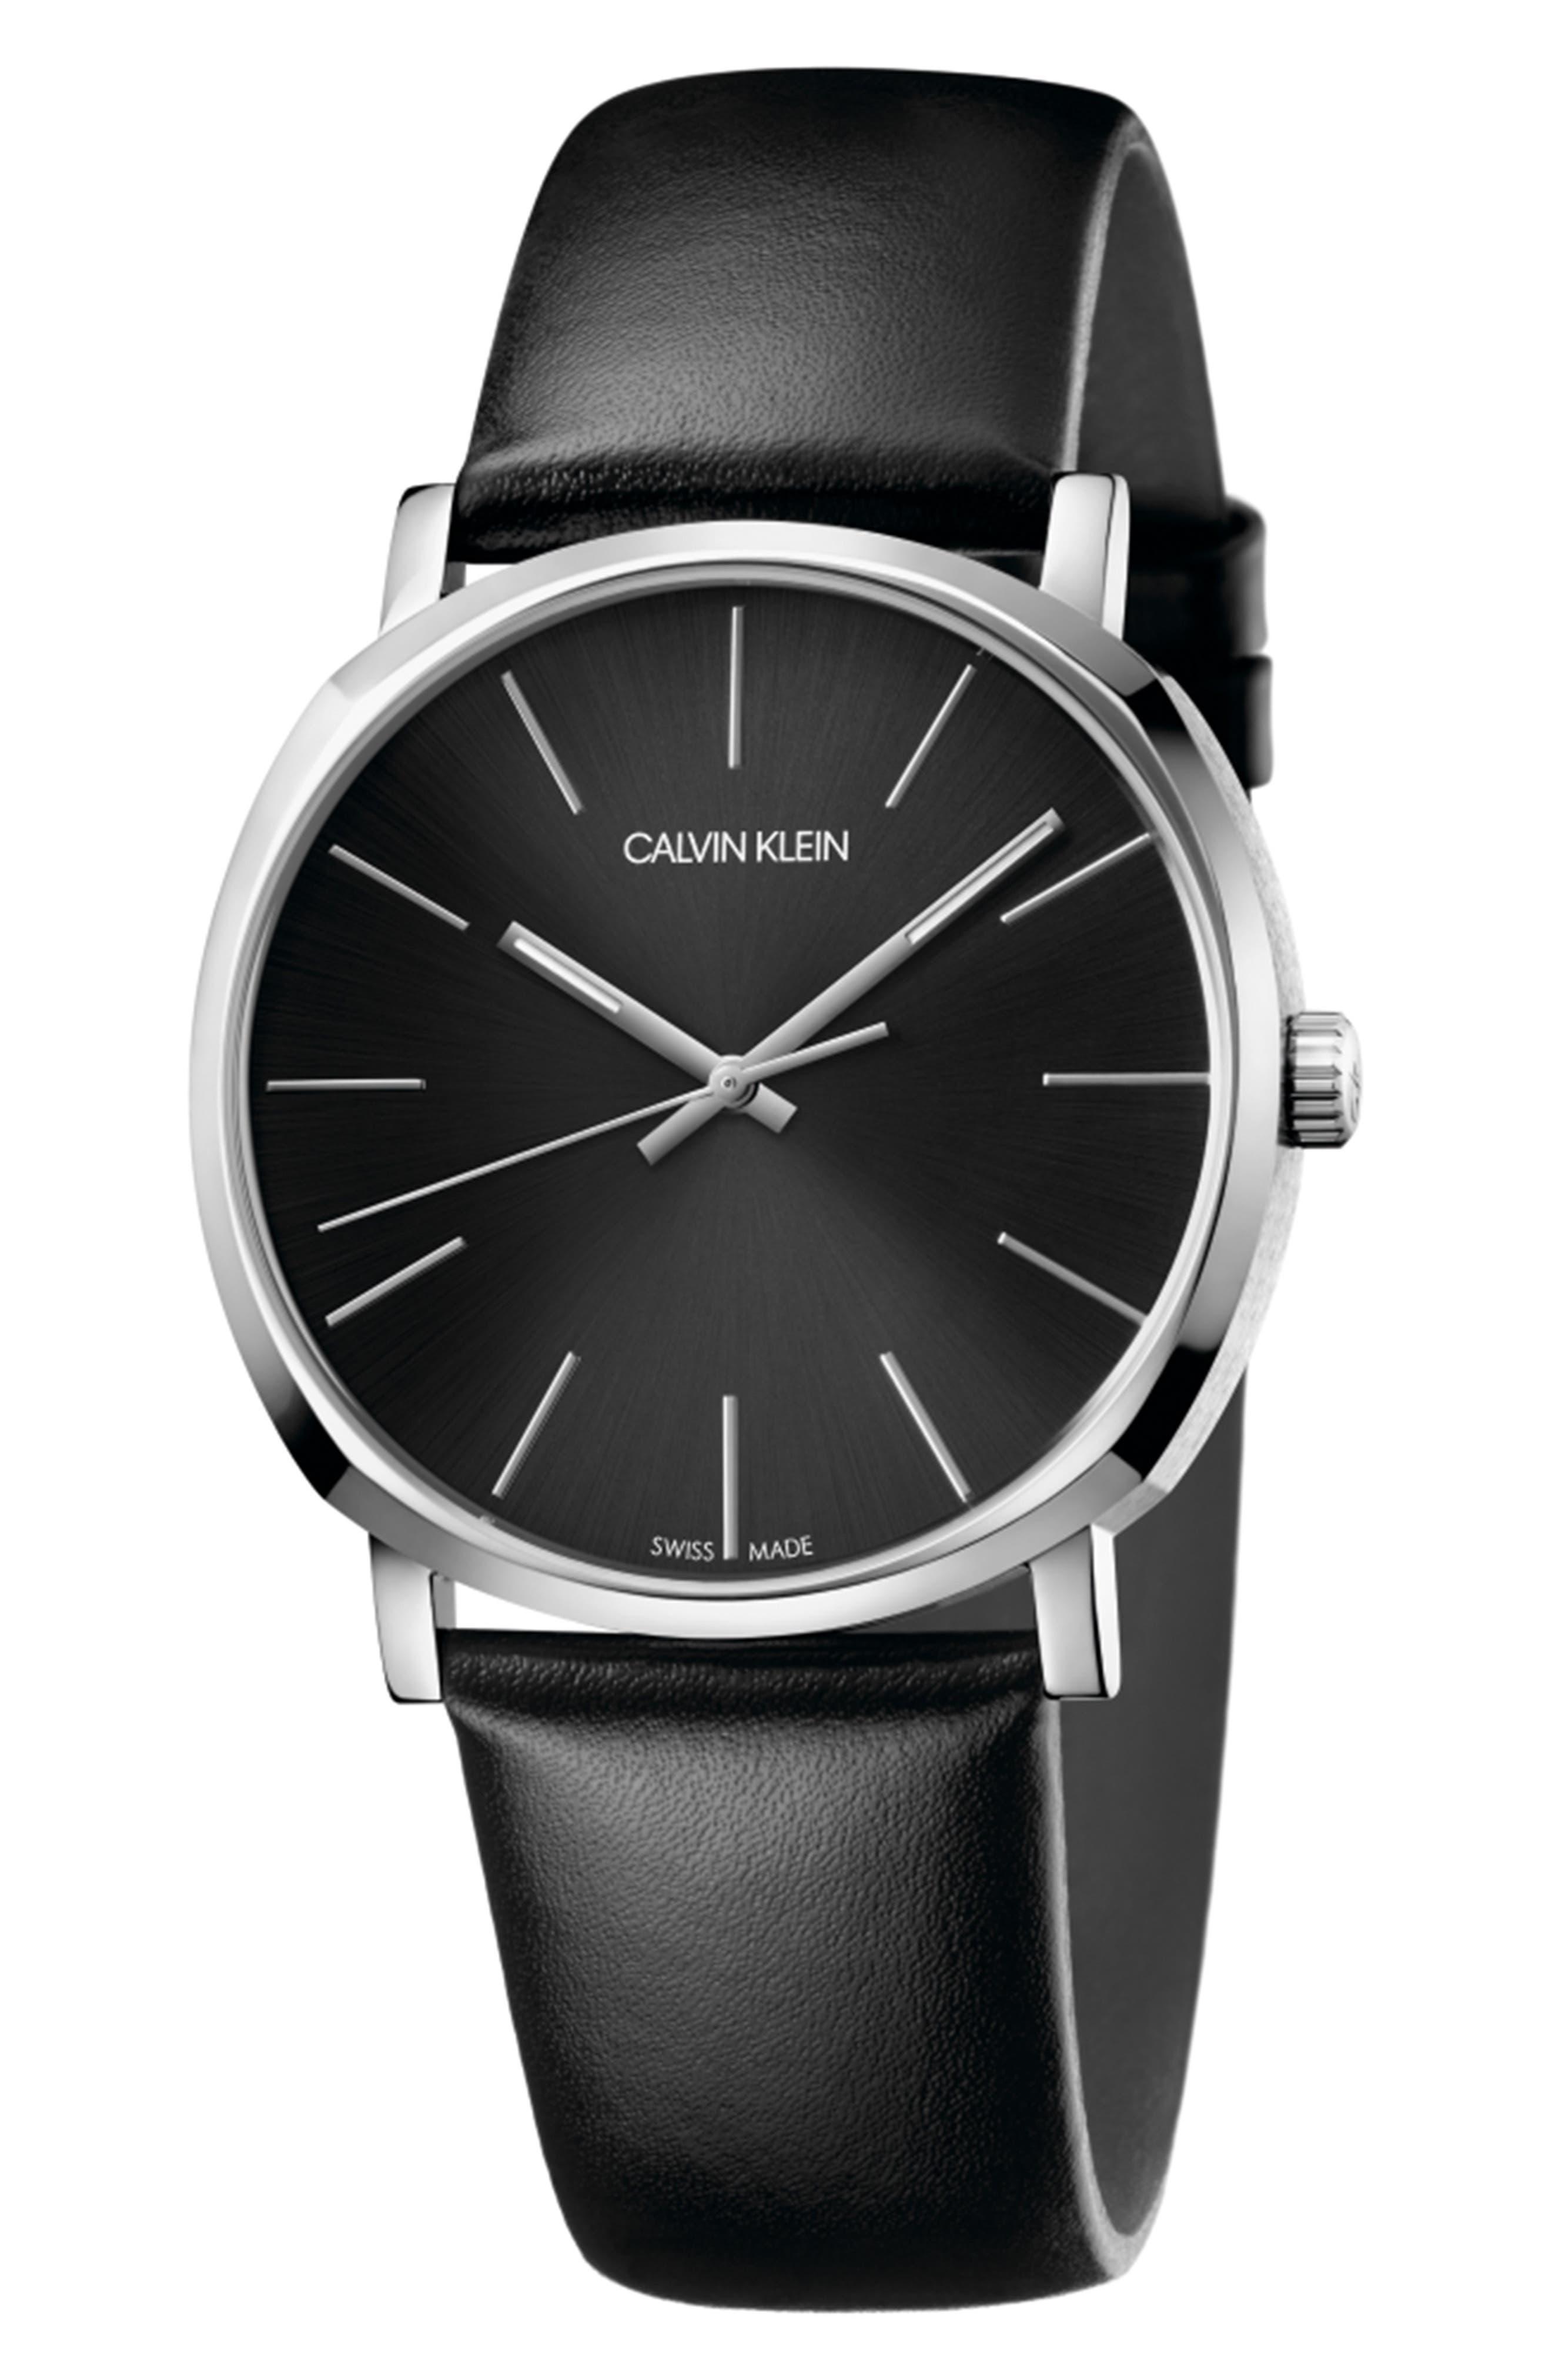 CALVIN KLEIN,                             Posh Leather Band Watch, 40mm,                             Main thumbnail 1, color,                             BLACK/ SILVER/ BLACK